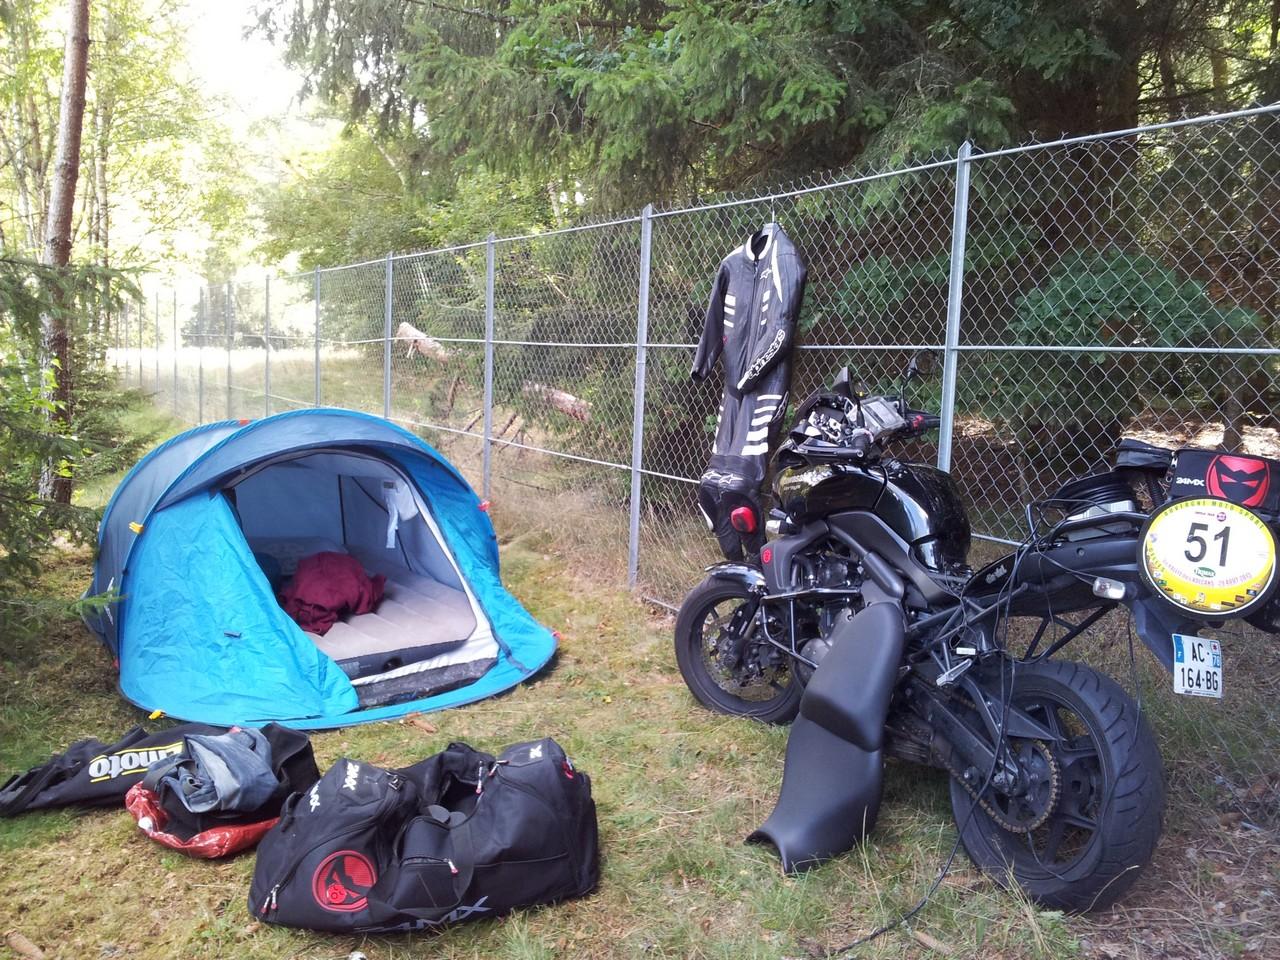 http://xpay.free.fr/CRs/Volcans%202015/camping.jpg